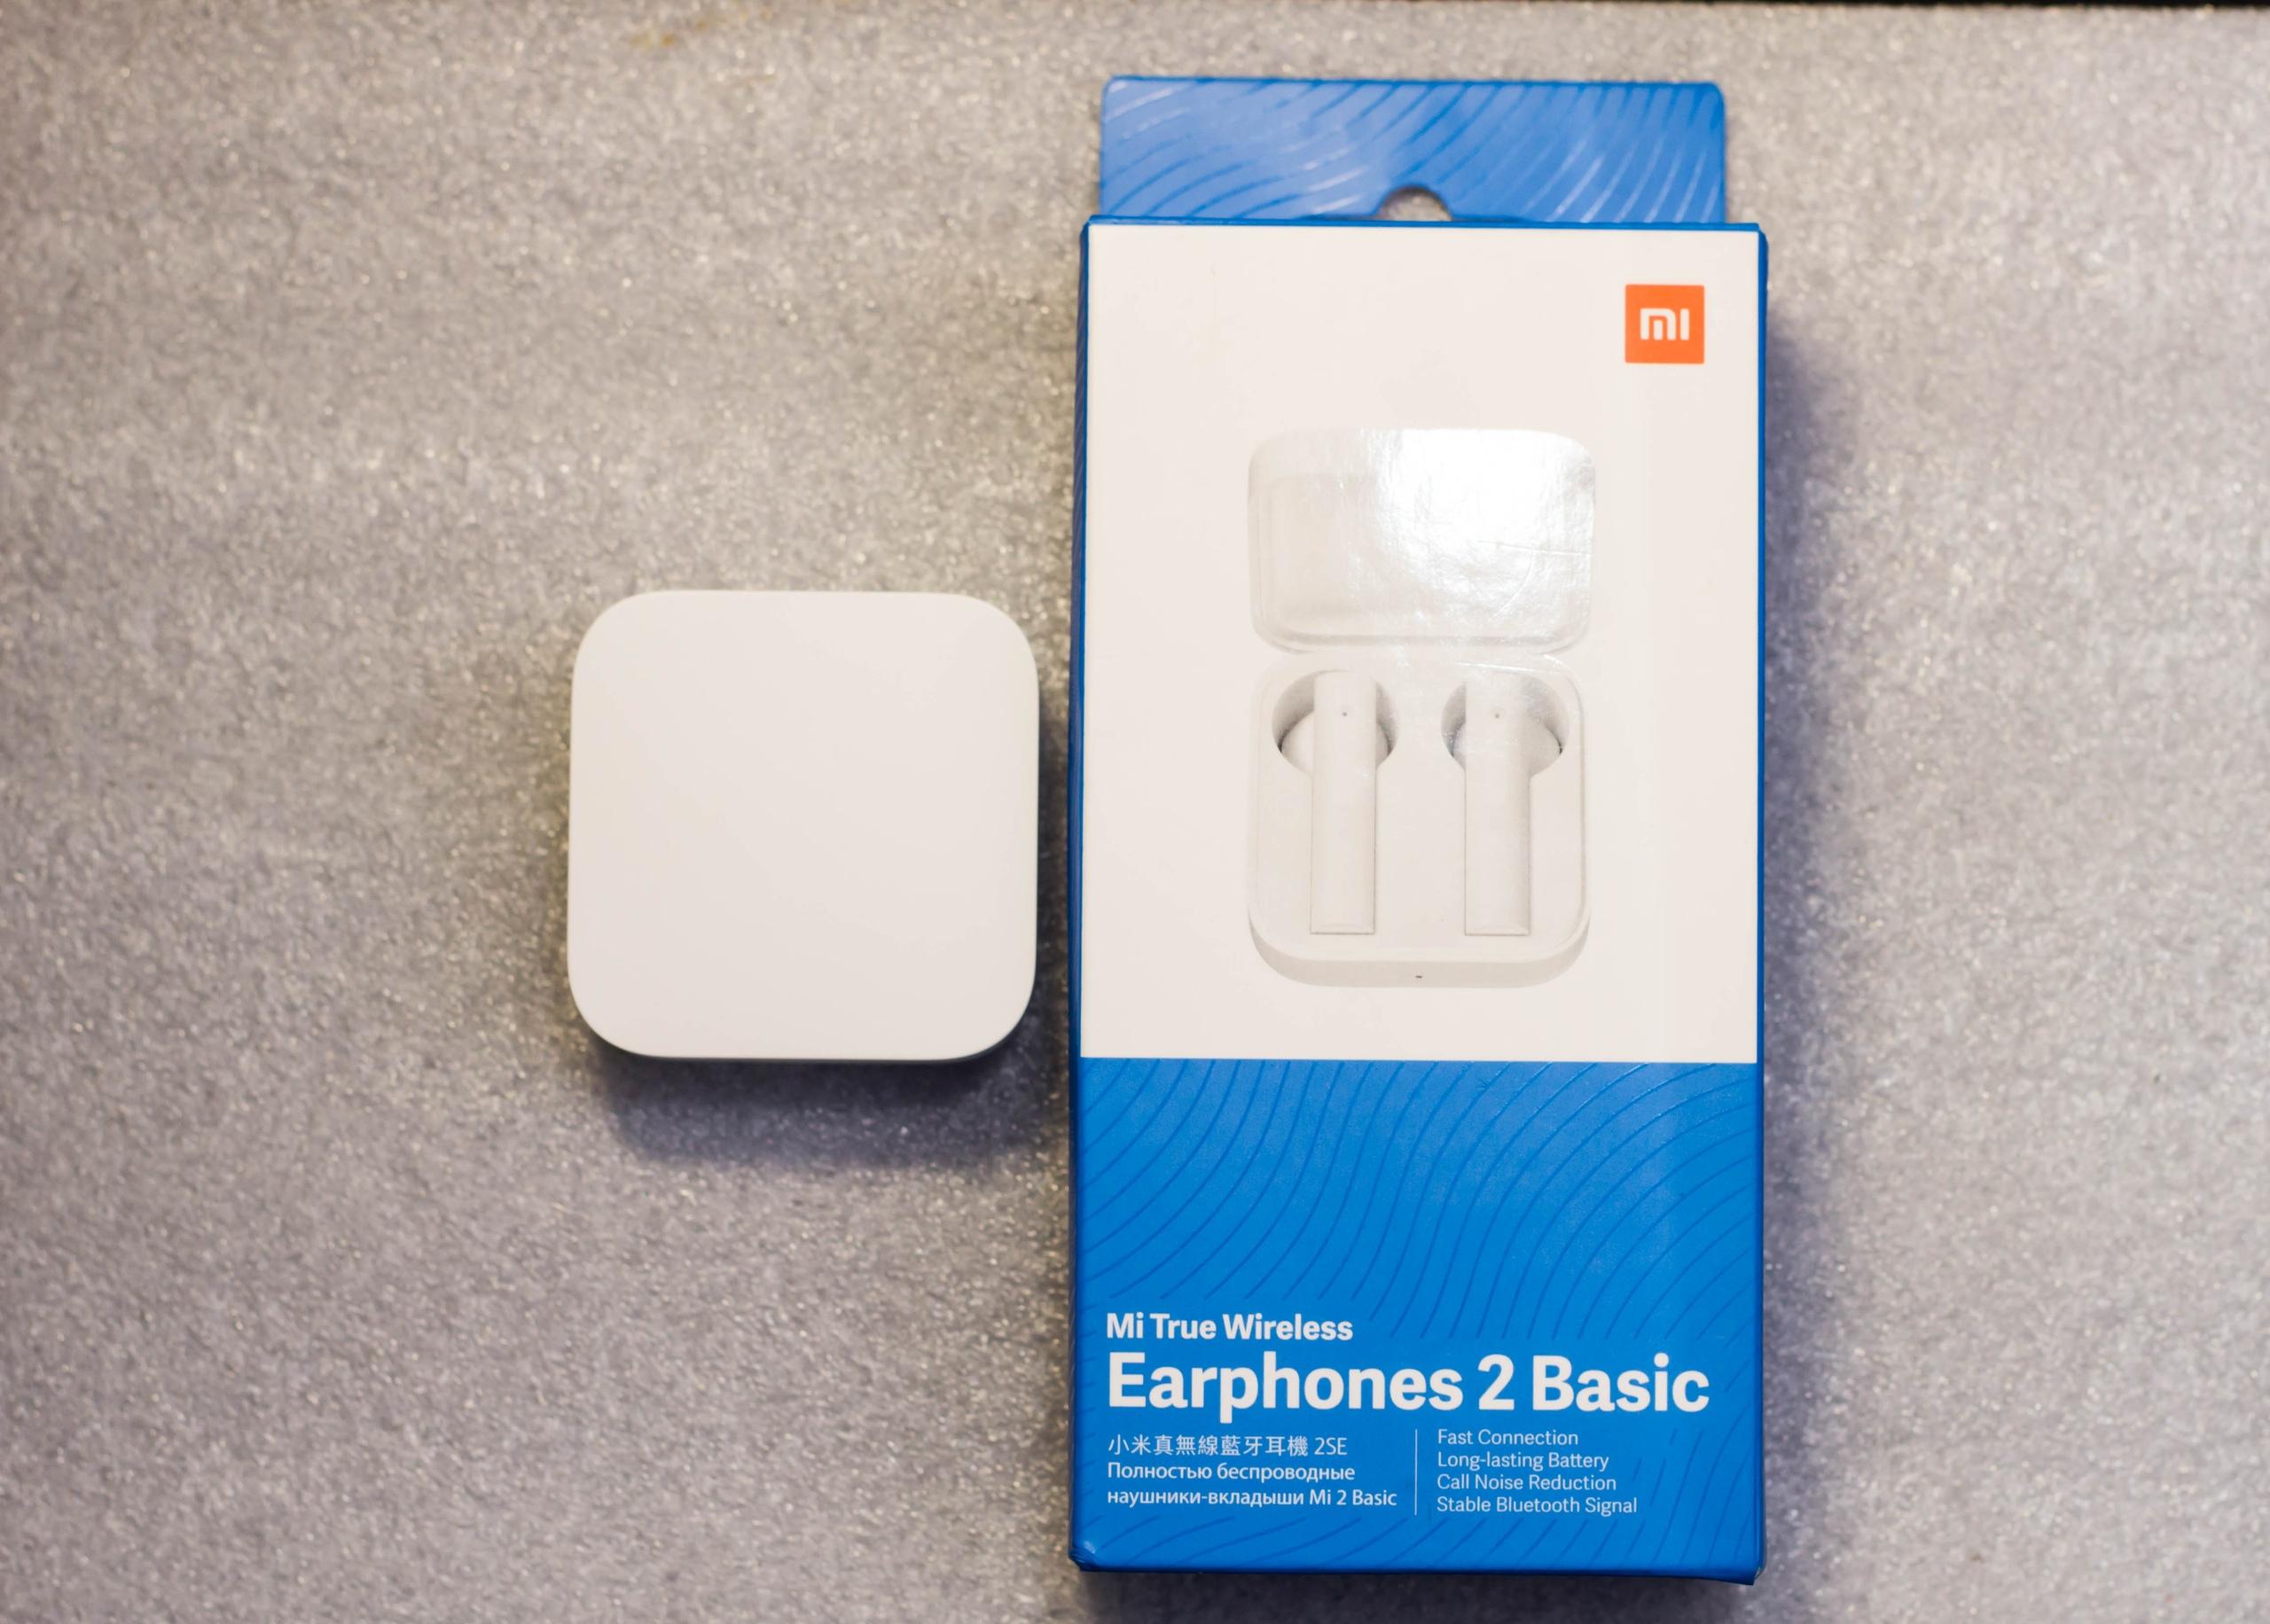 Наушники Mi True Wireless Earphones 2 Basic: тестирование звука и микрофона